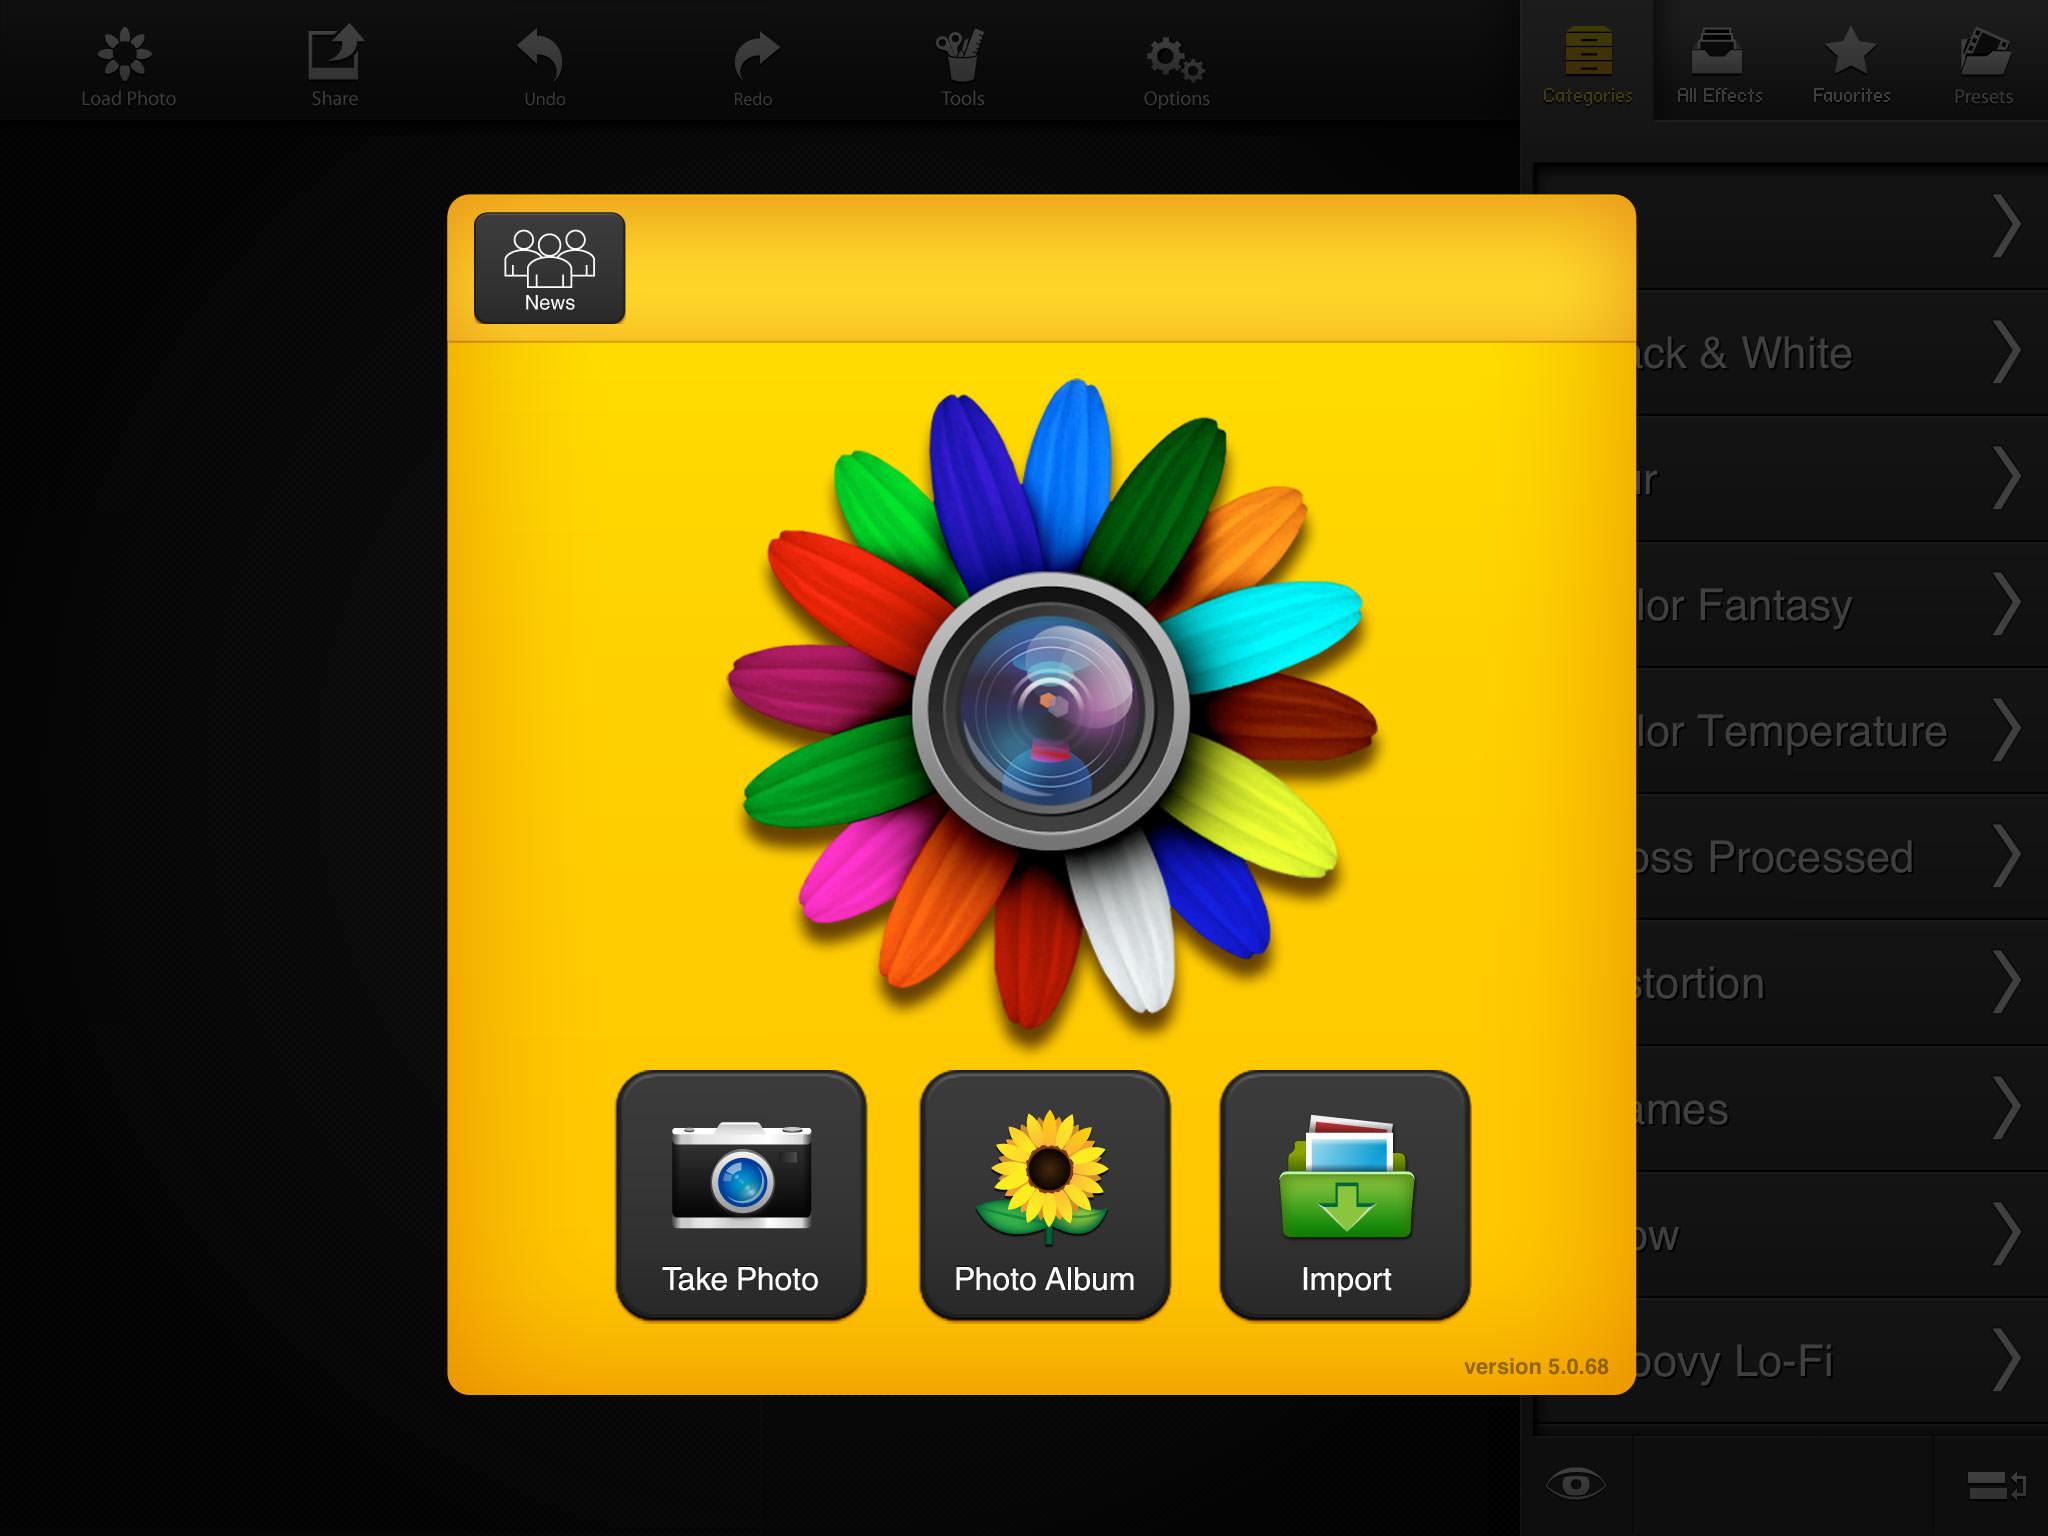 FX Photo Studio HD Version 5 iPad App | ePHOTOzine